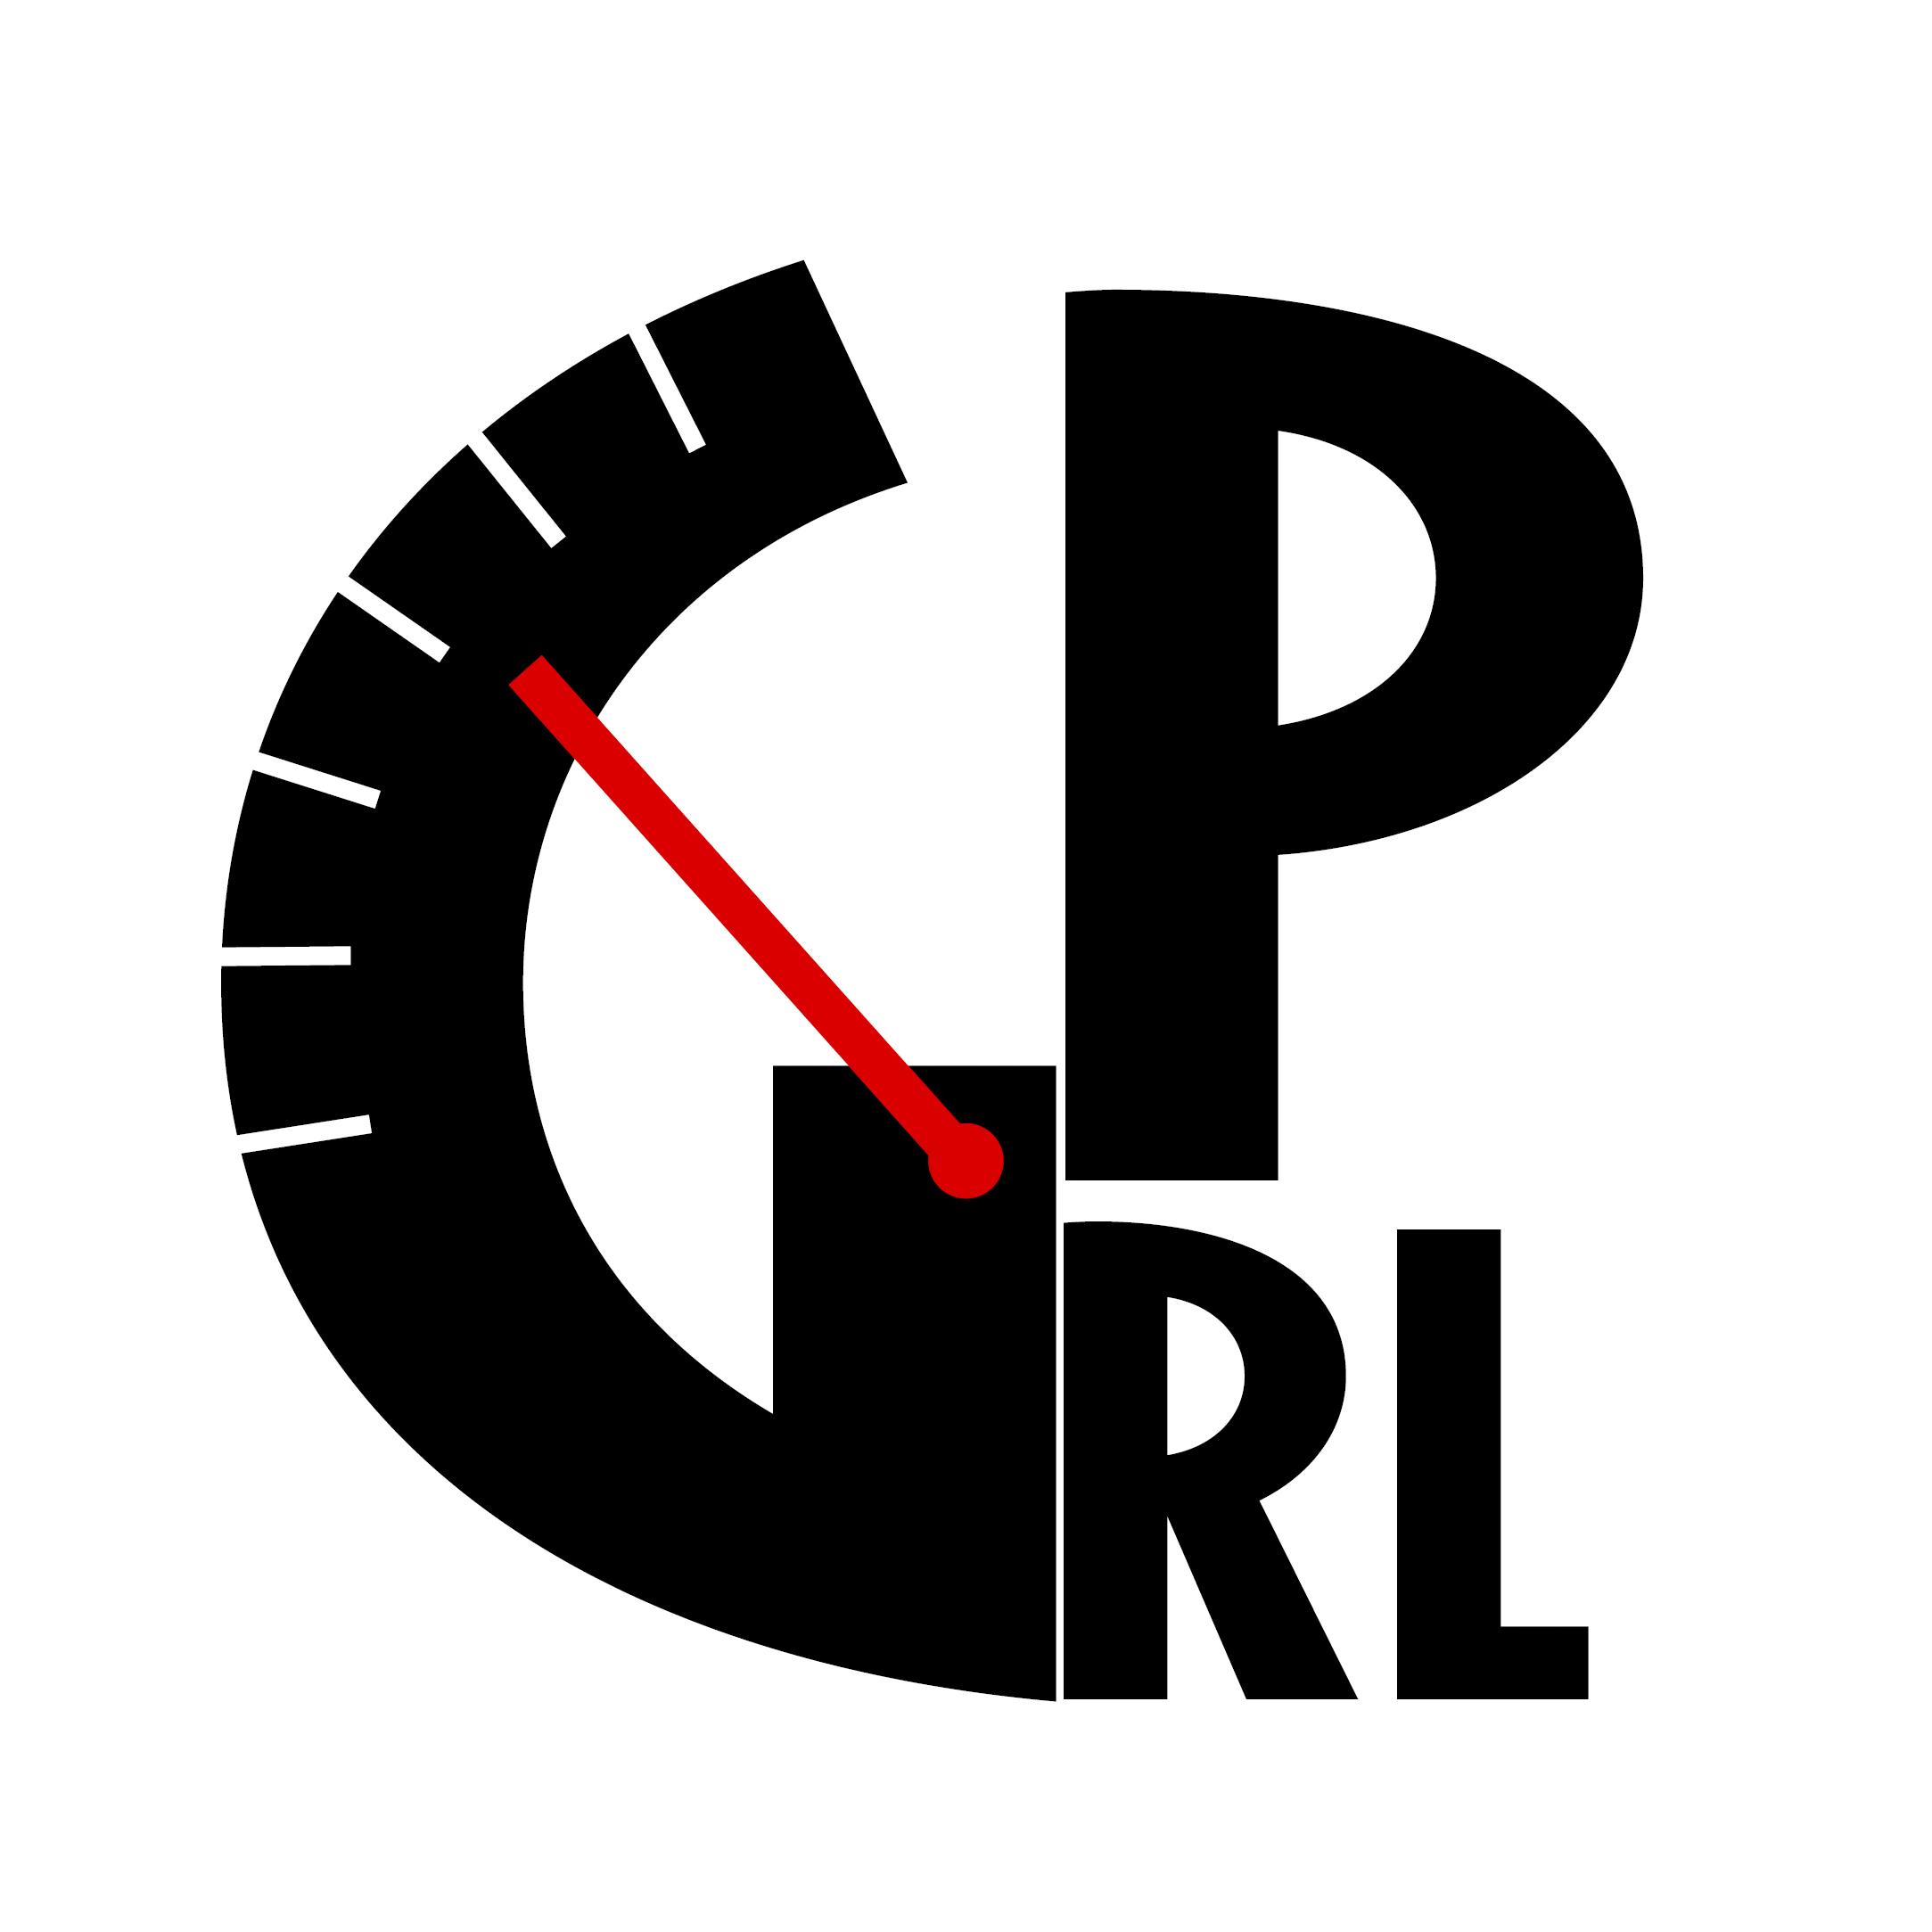 GpGrl.com